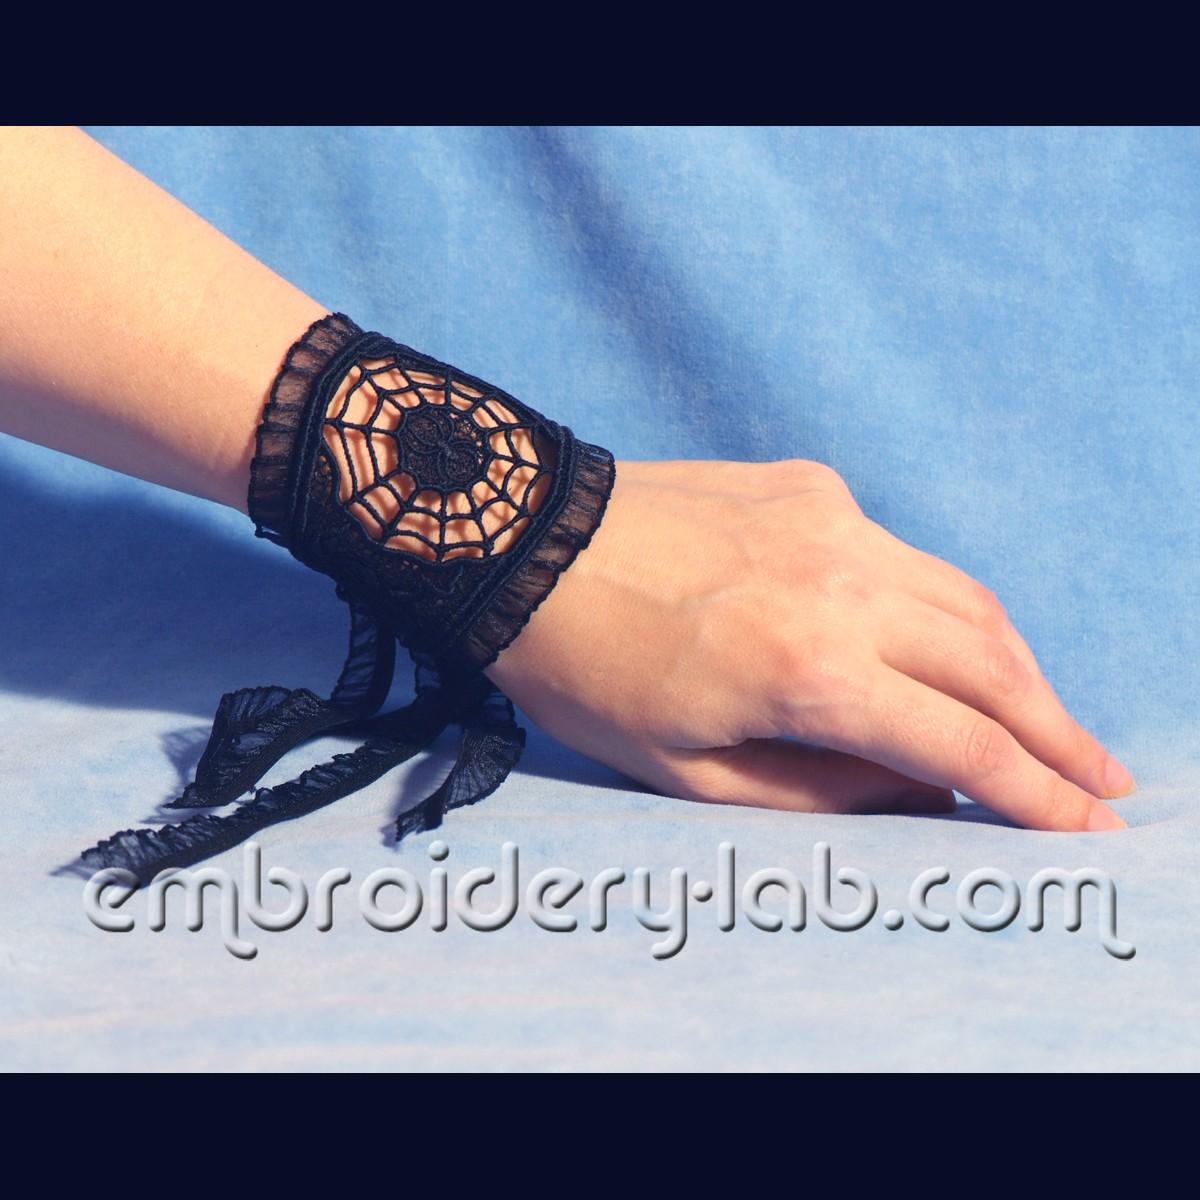 Bracelet Spider 0002 Lace